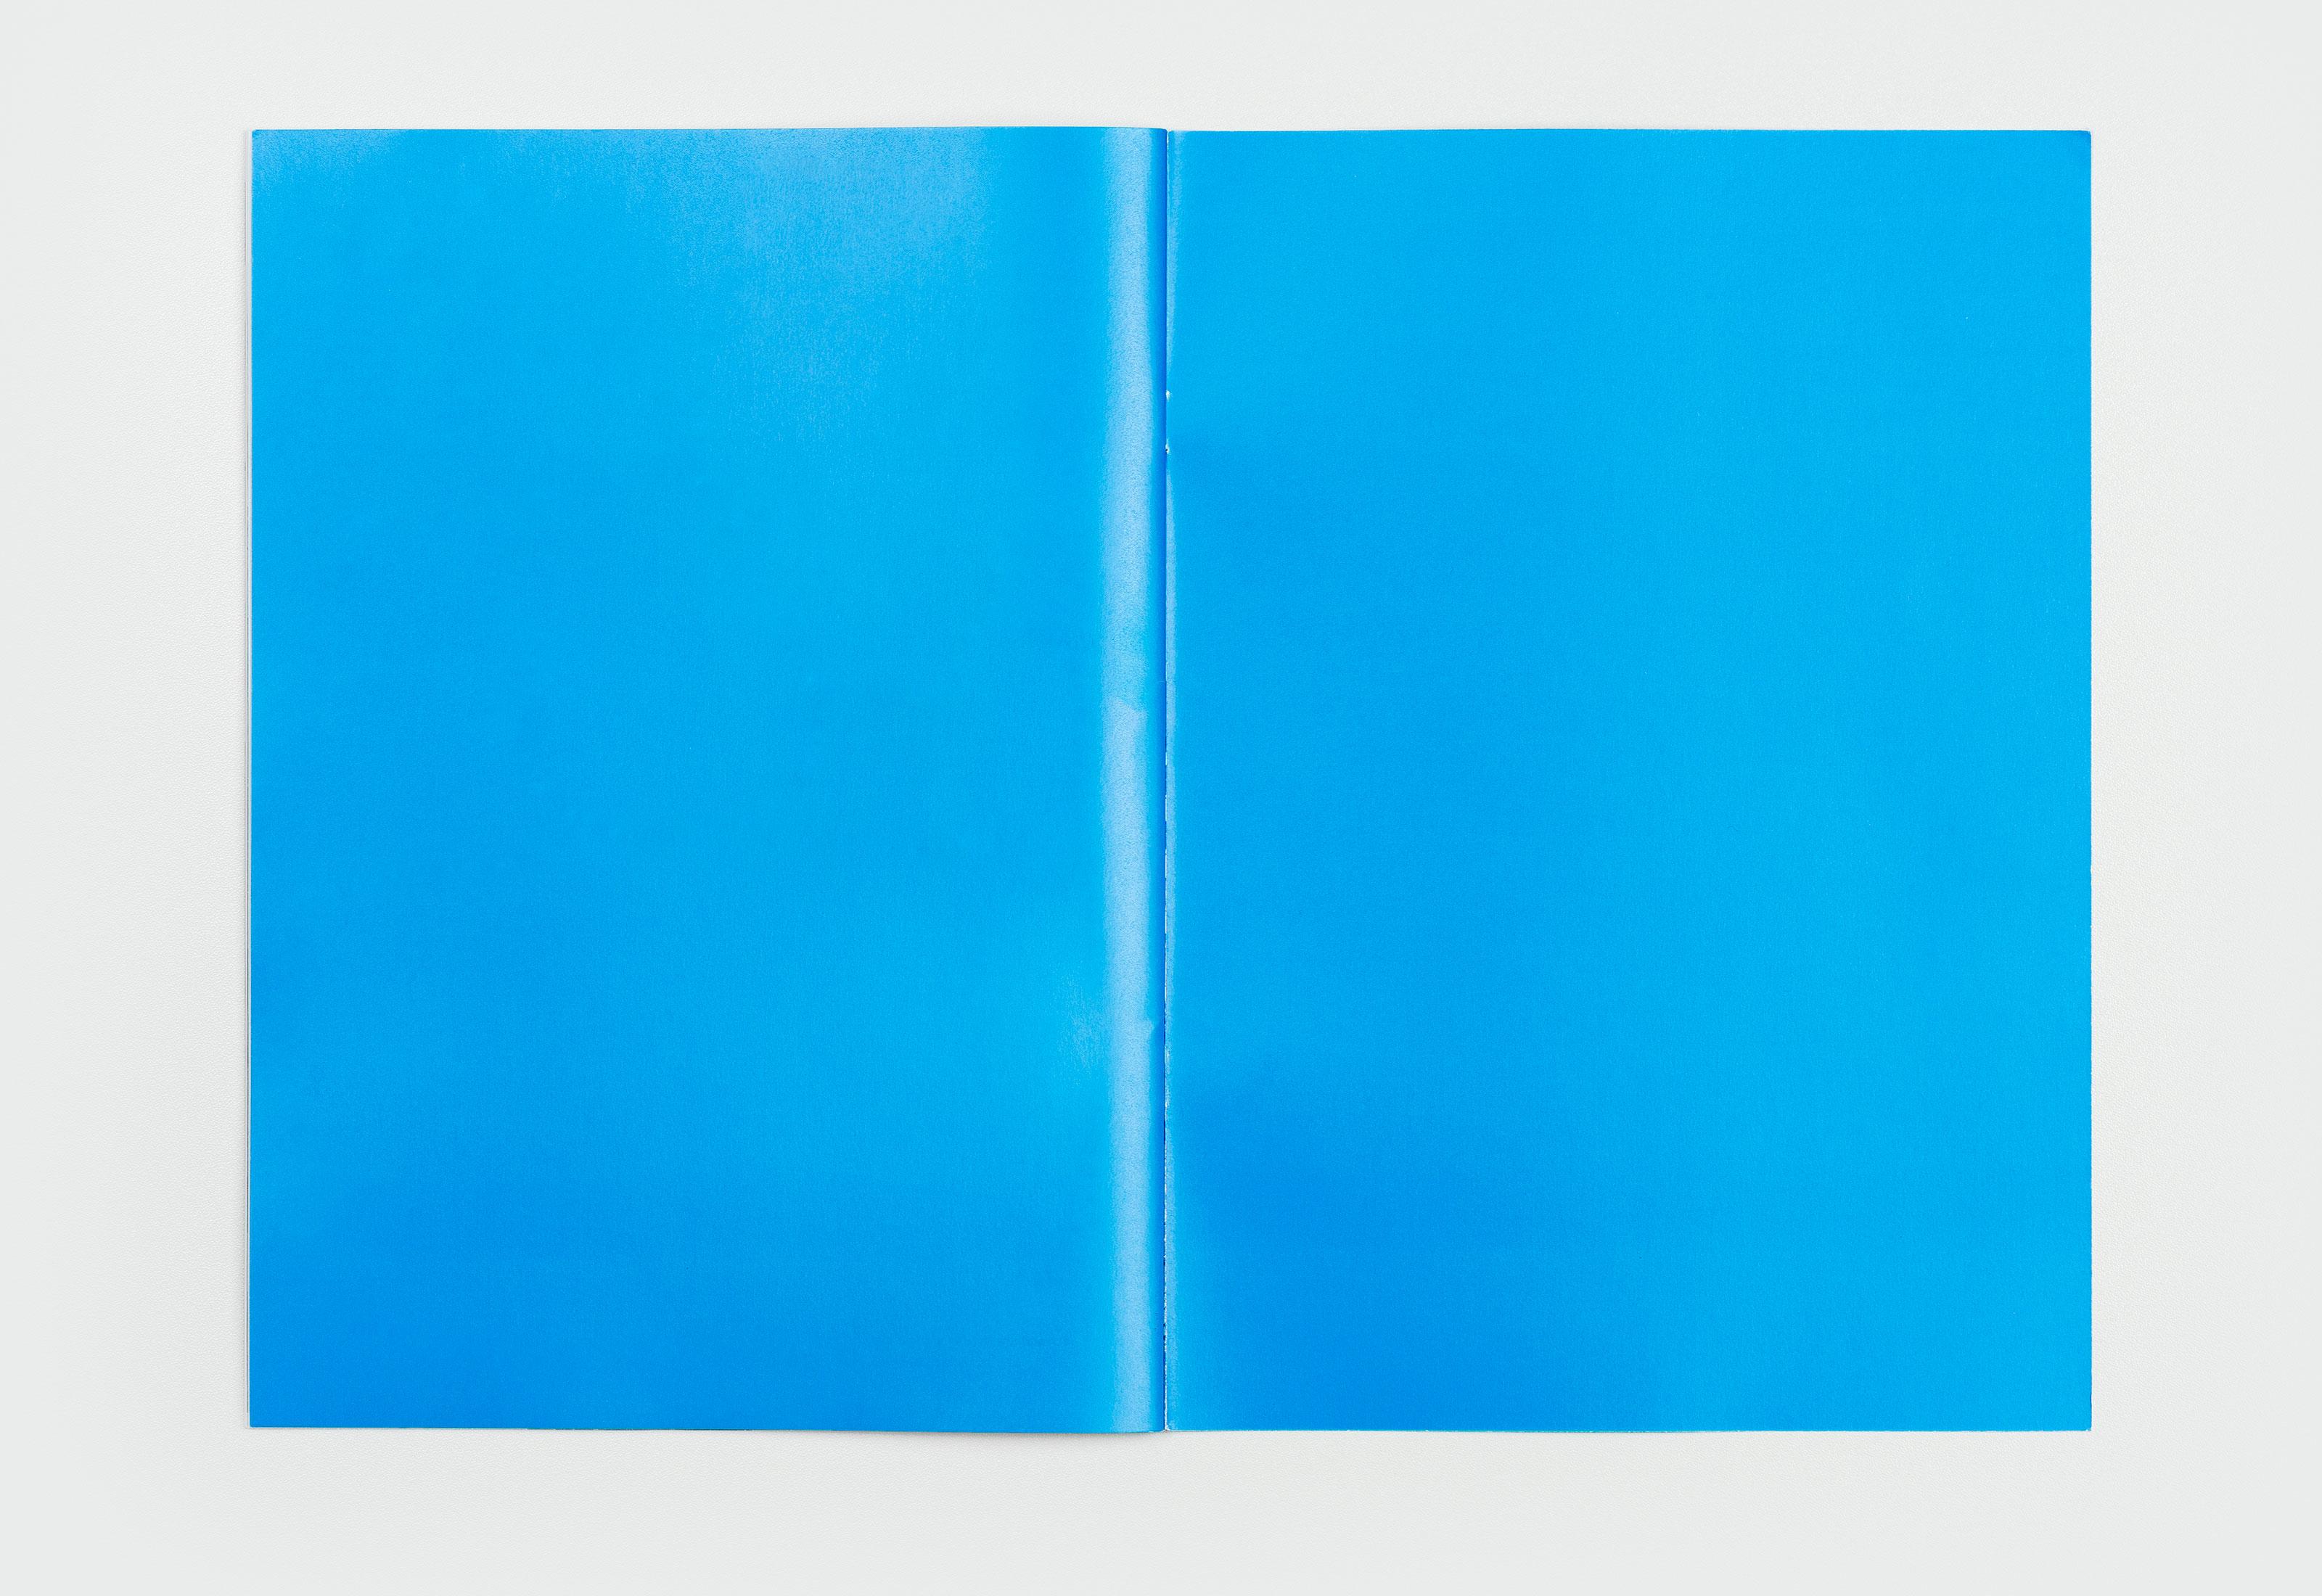 Reformierte Medien – Jahresbericht 2015, endpaper blue ©Atelier Pol × Barbara Hess